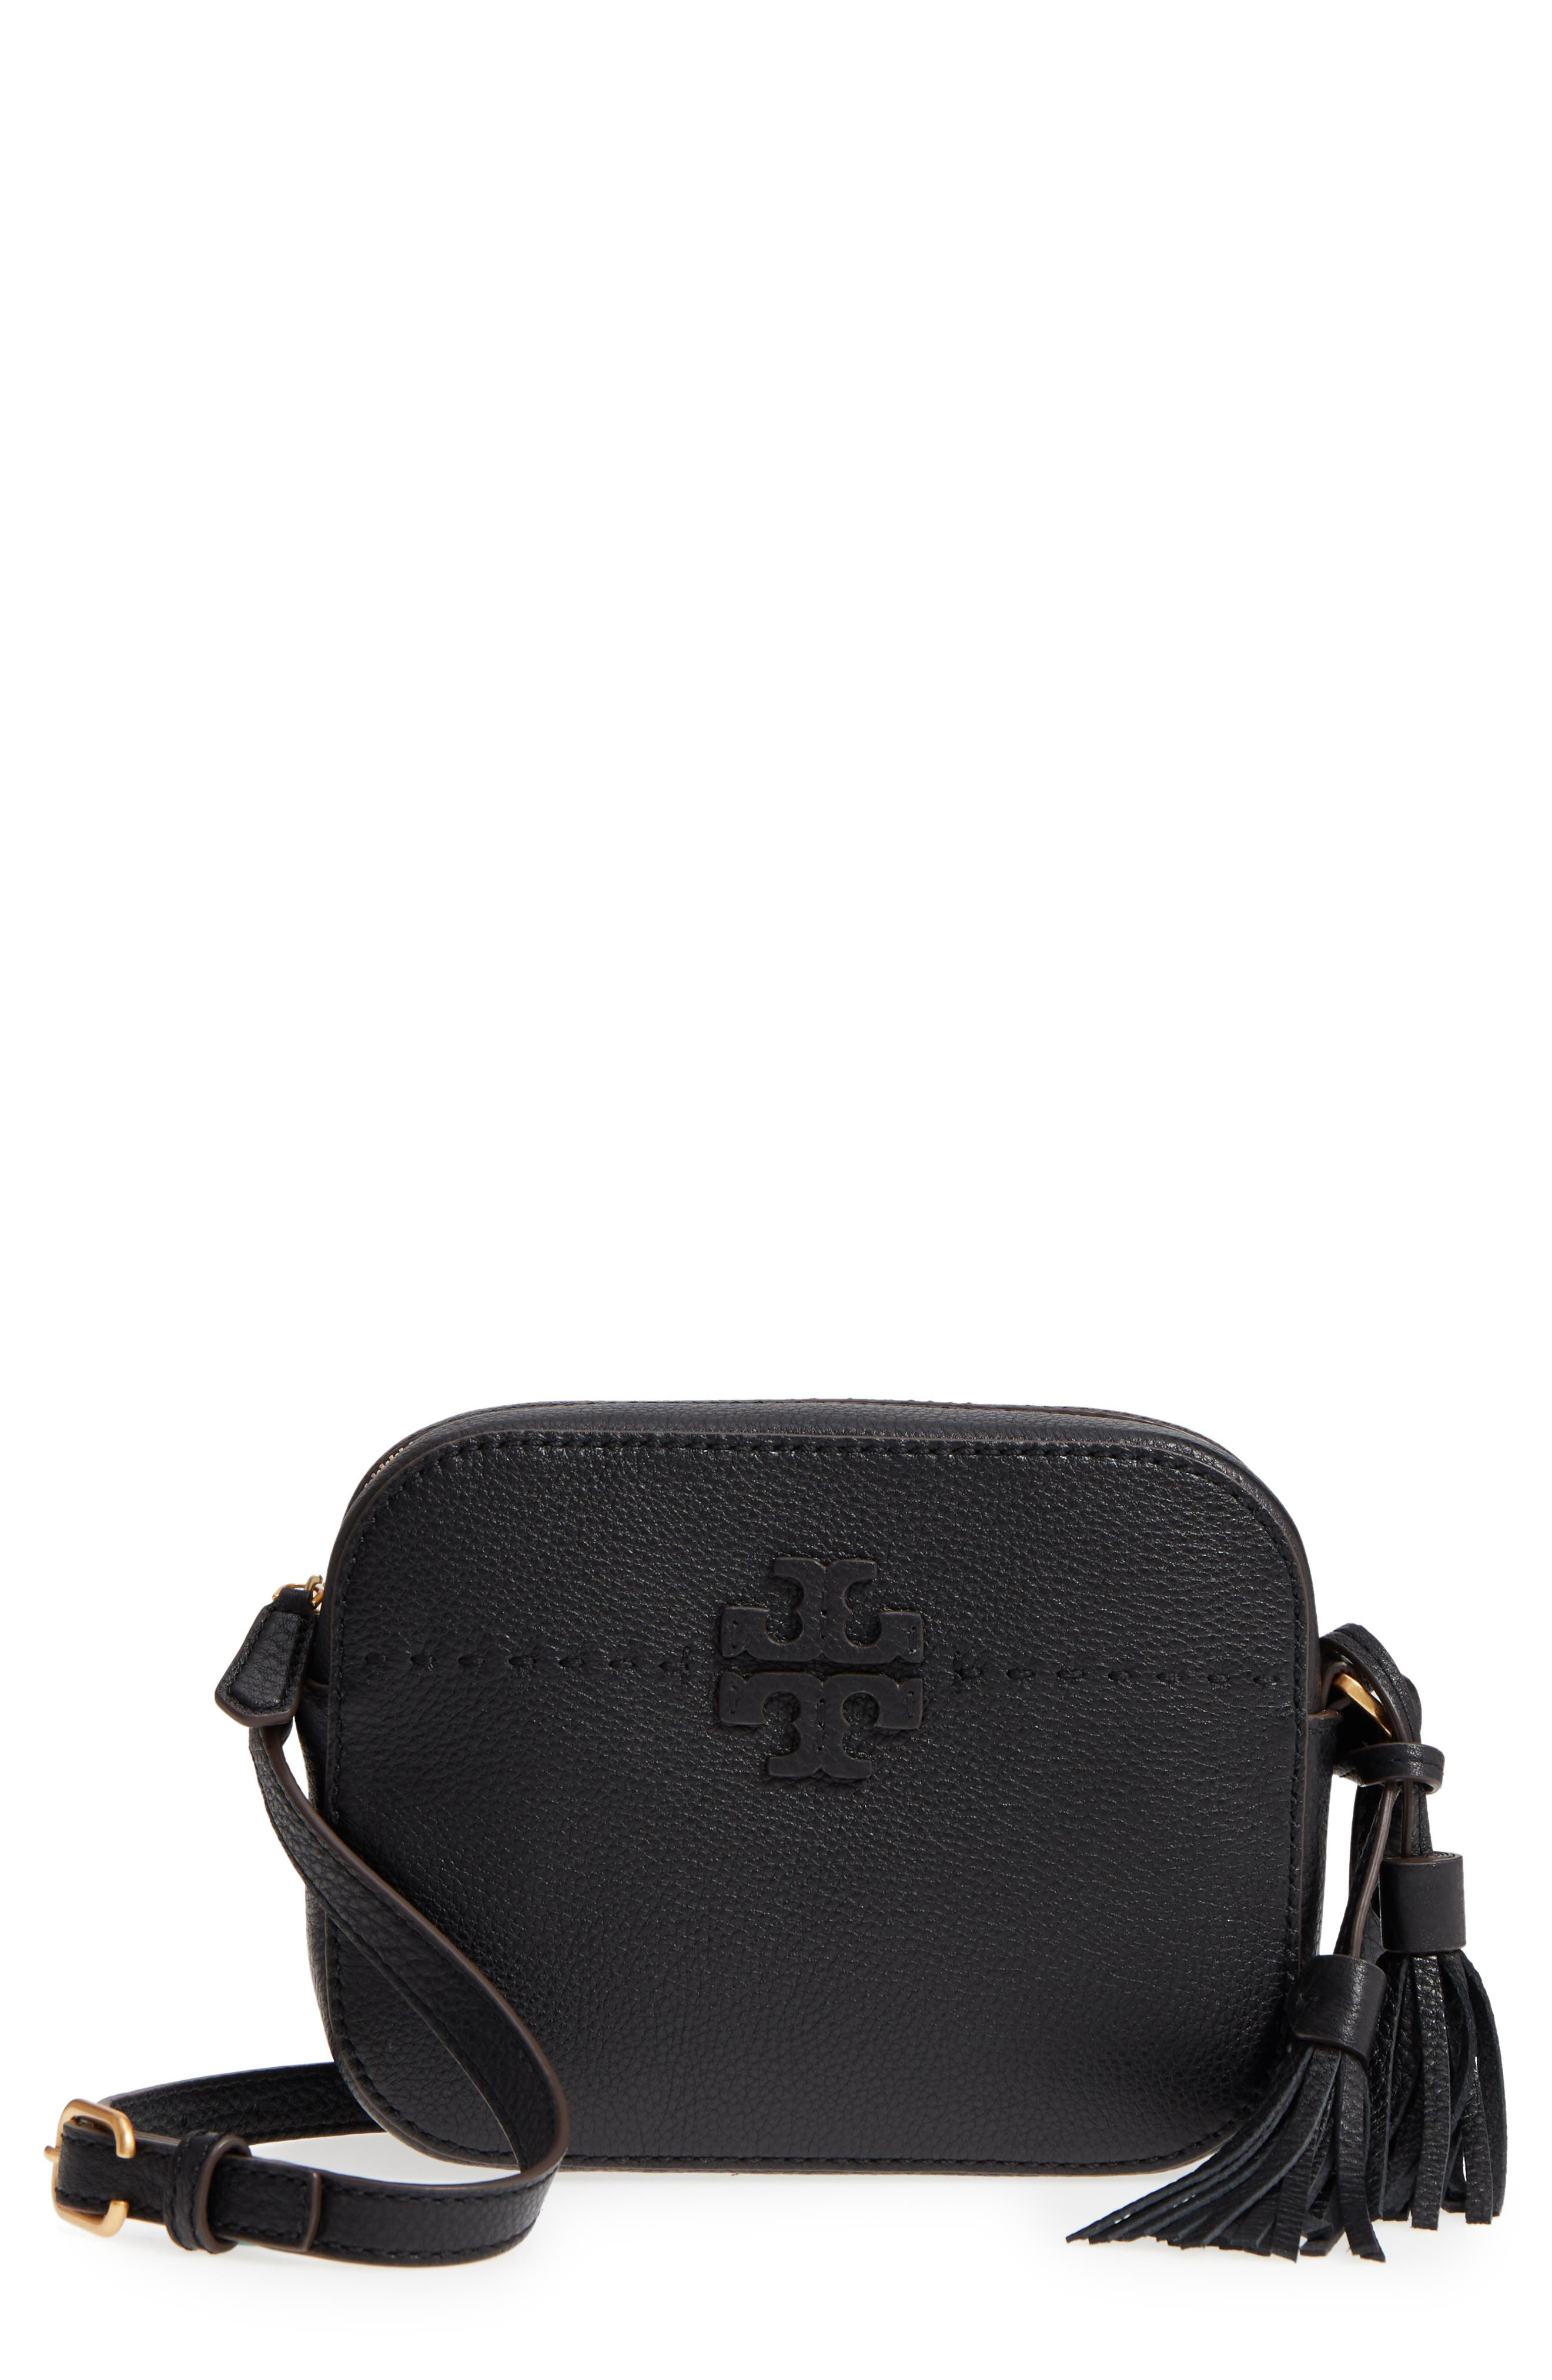 McGraw Leather Camera Bag,                             Main thumbnail 1, color,                             001